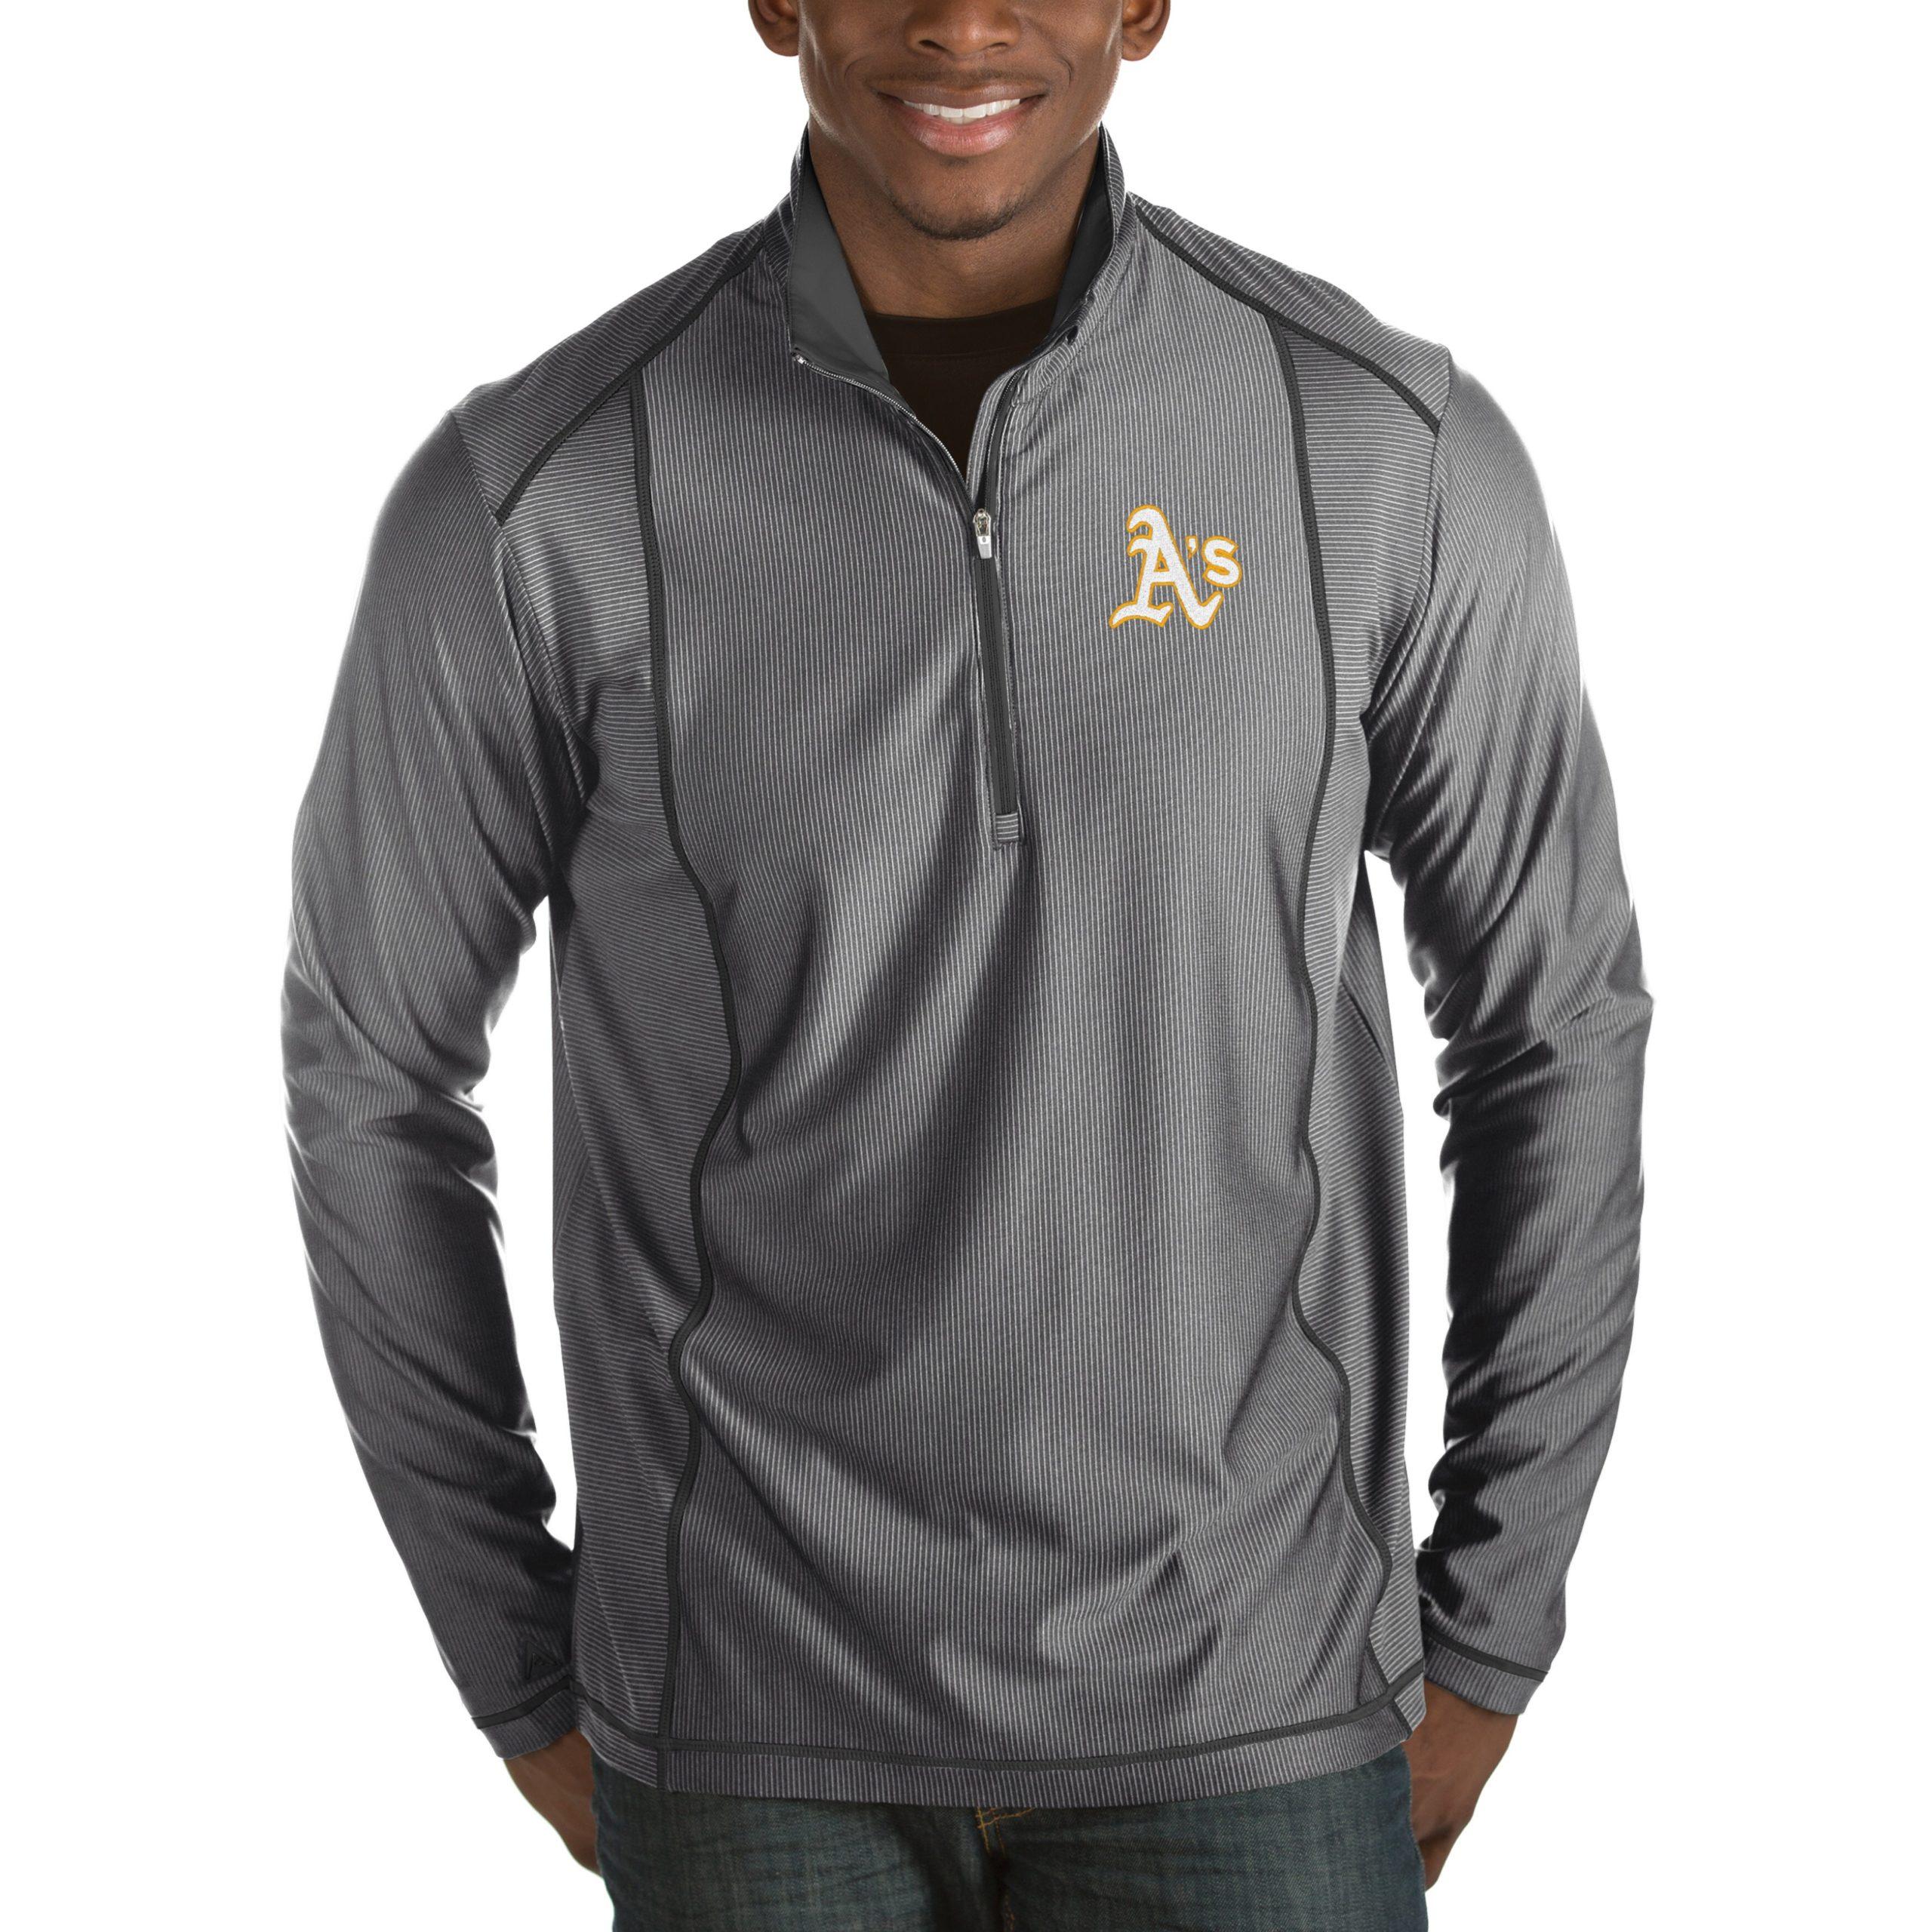 Oakland Athletics Antigua Tempo Half-Zip Pullover Jacket - Heathered Charcoal